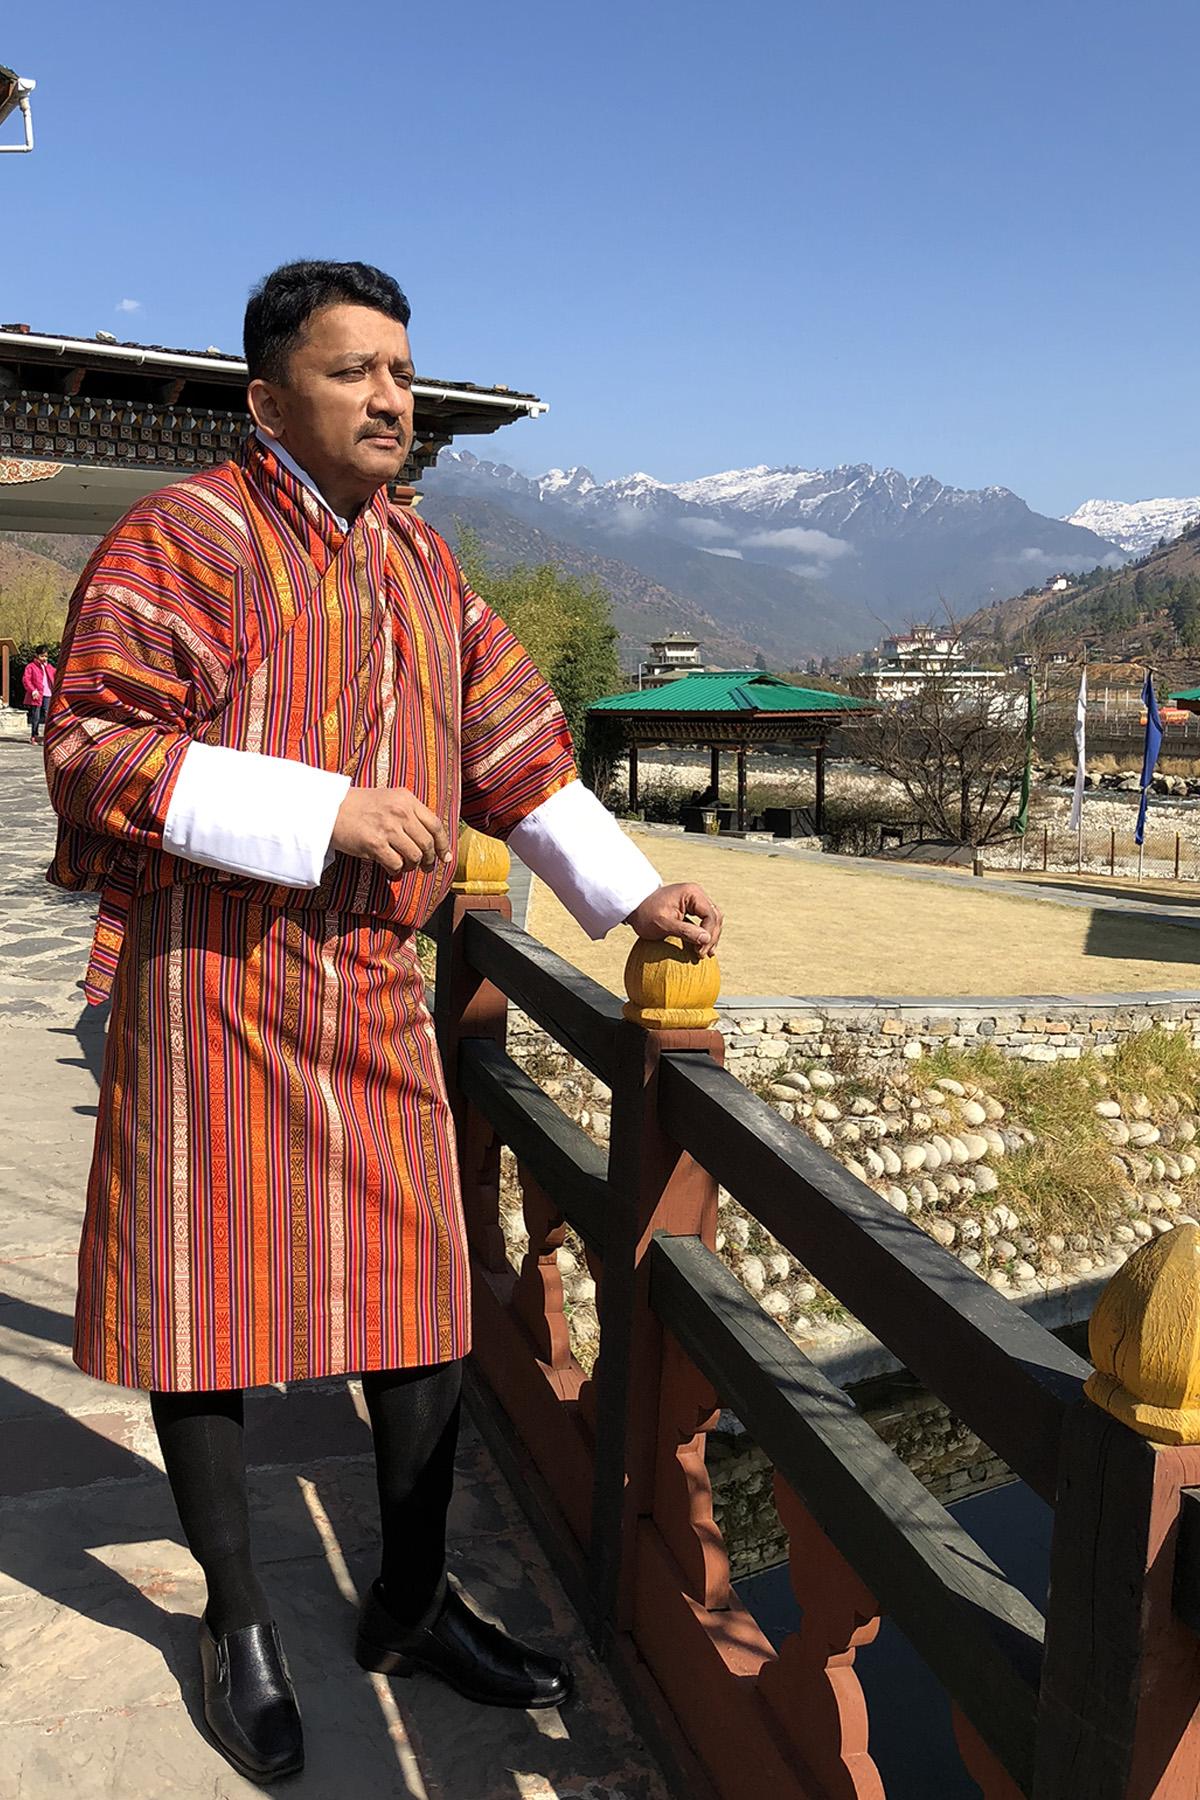 Dr S M Balaji attired in the Gho Kera, the national attire for men in Bhutan